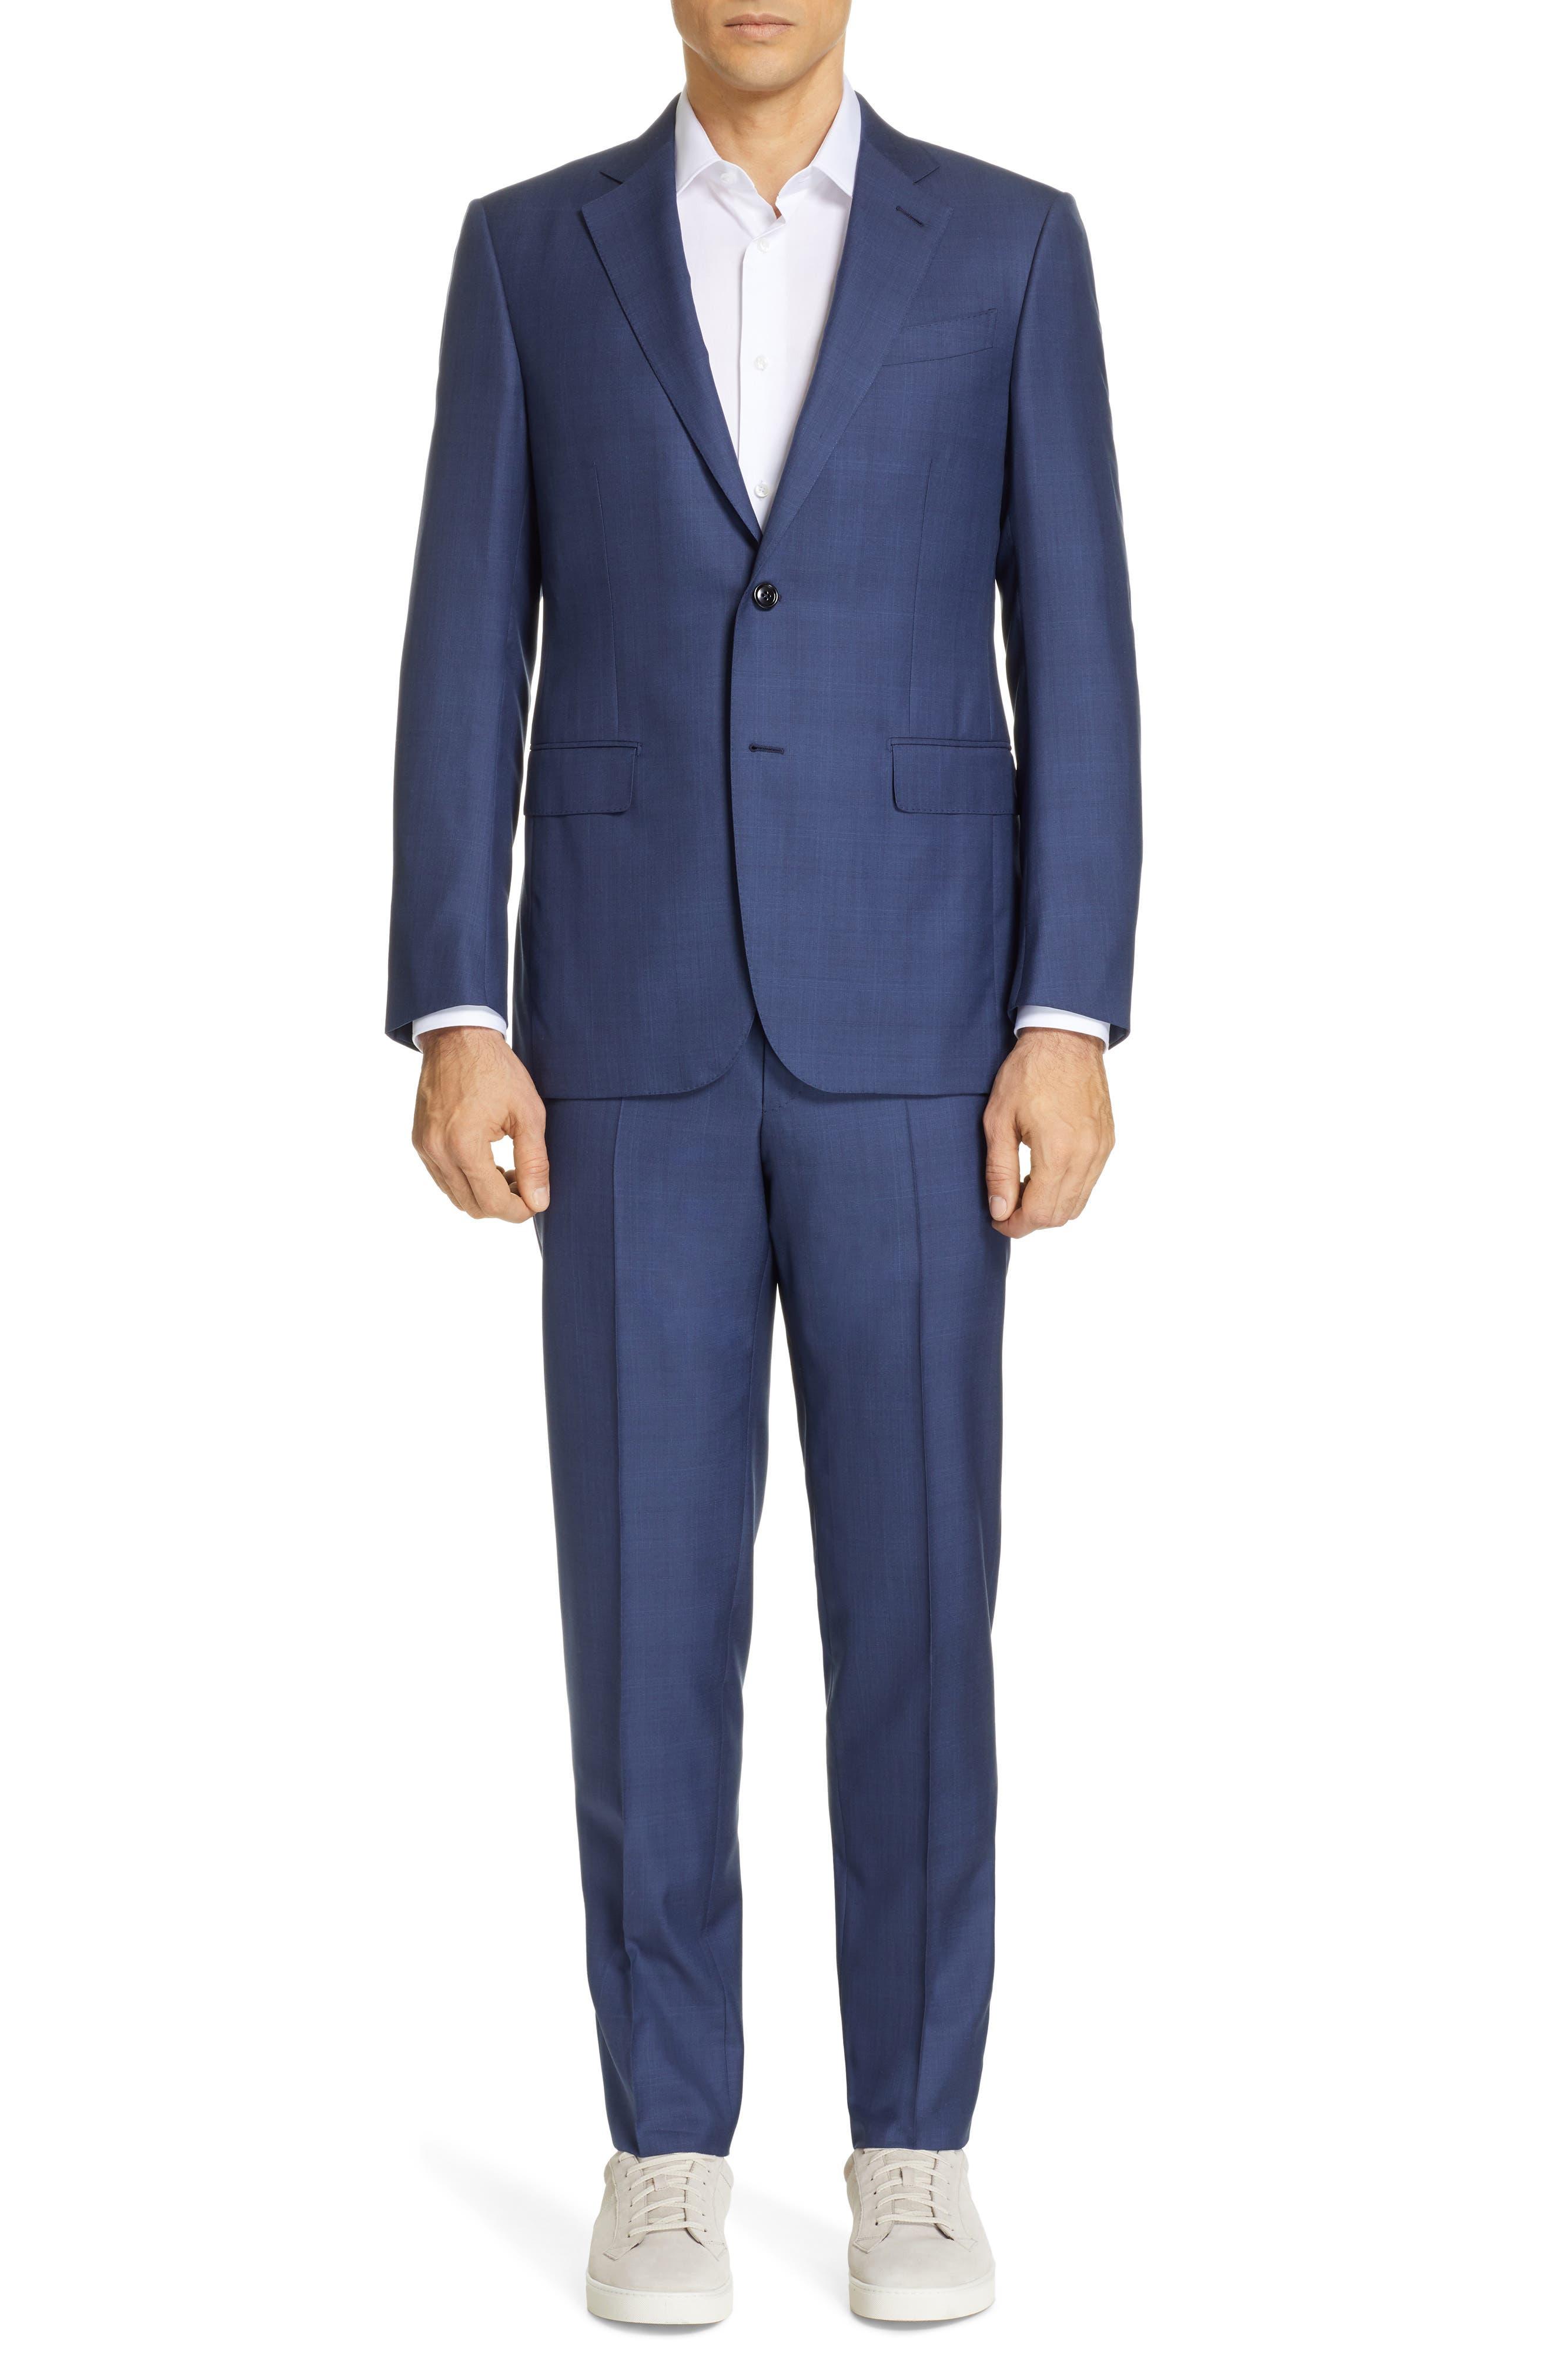 ERMENEGILDO ZEGNA, Trofeo Classic Fit Plaid Wool & Silk Suit, Main thumbnail 1, color, BLUE